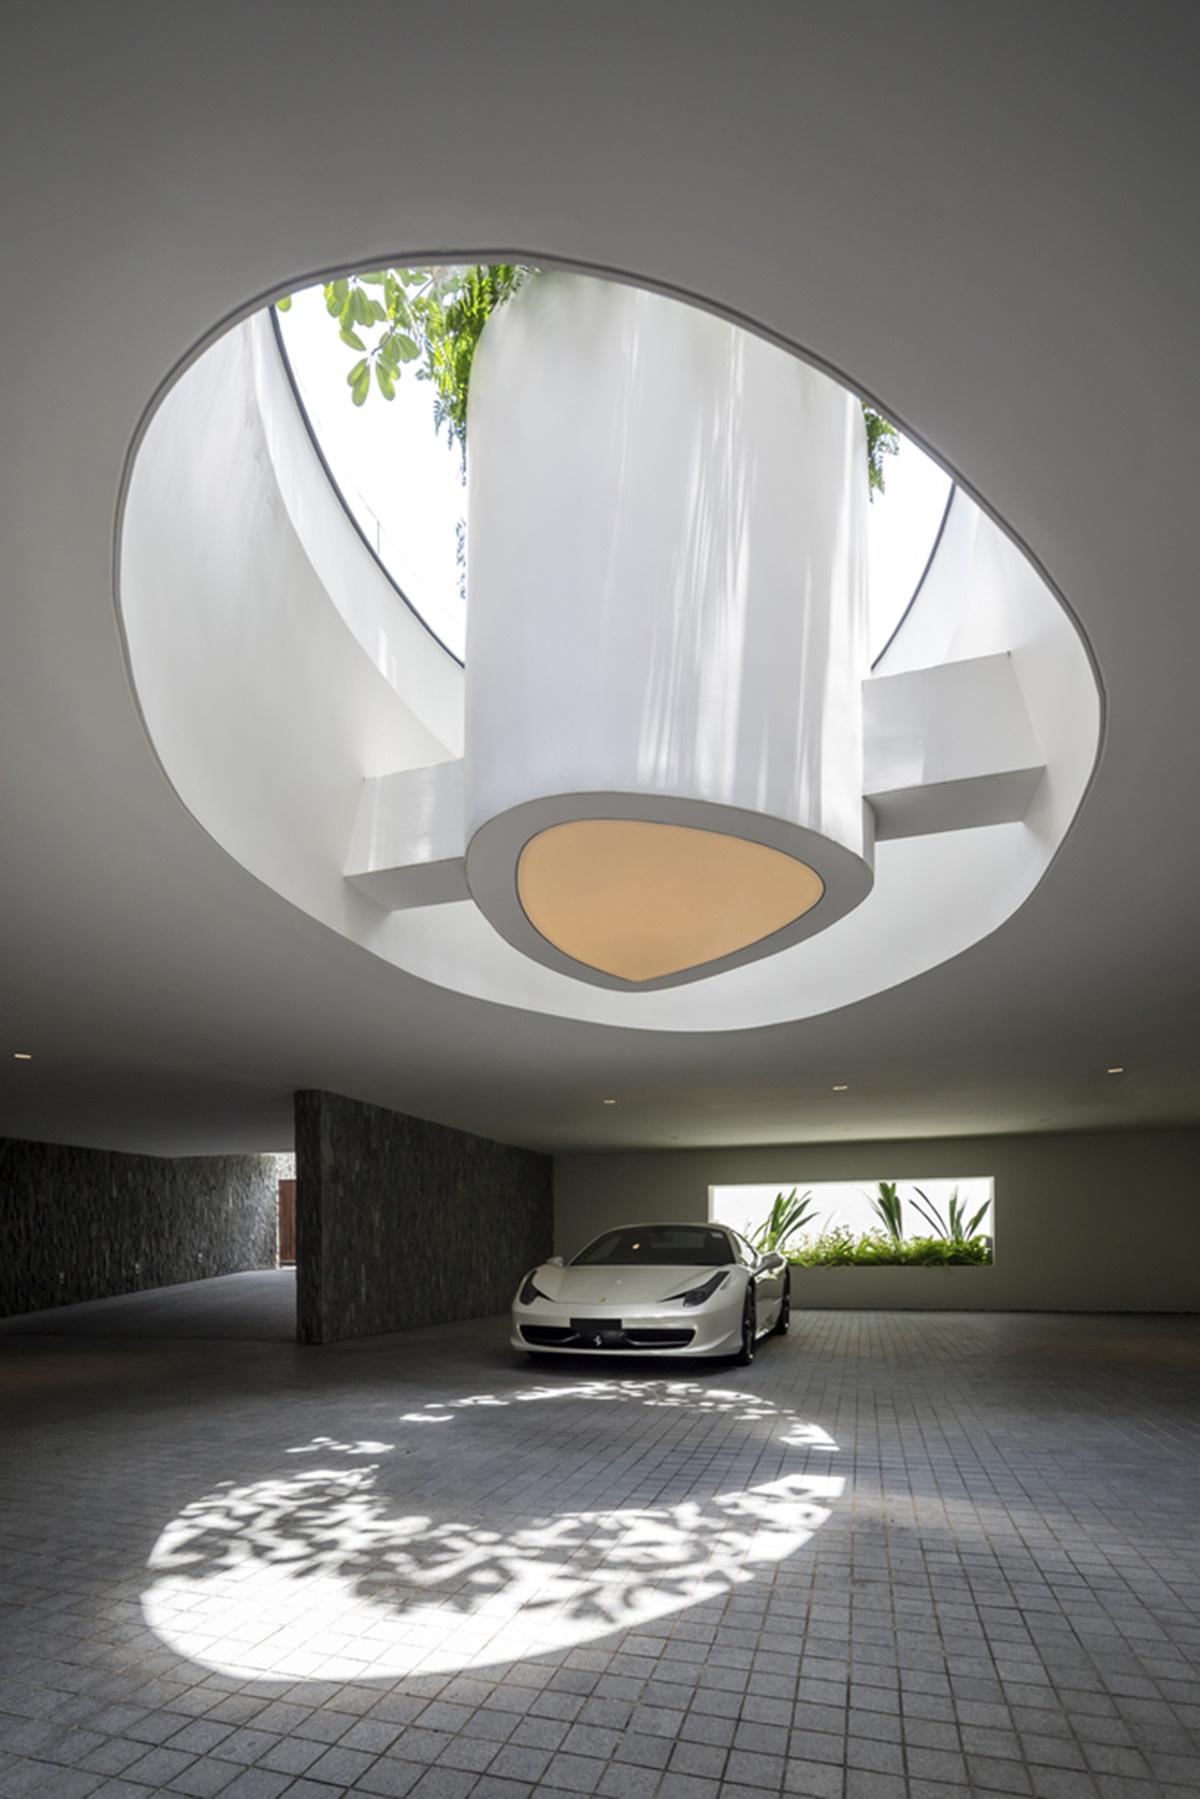 kien viet ngoi nha mo uoc Wallflower Architecture Design 33